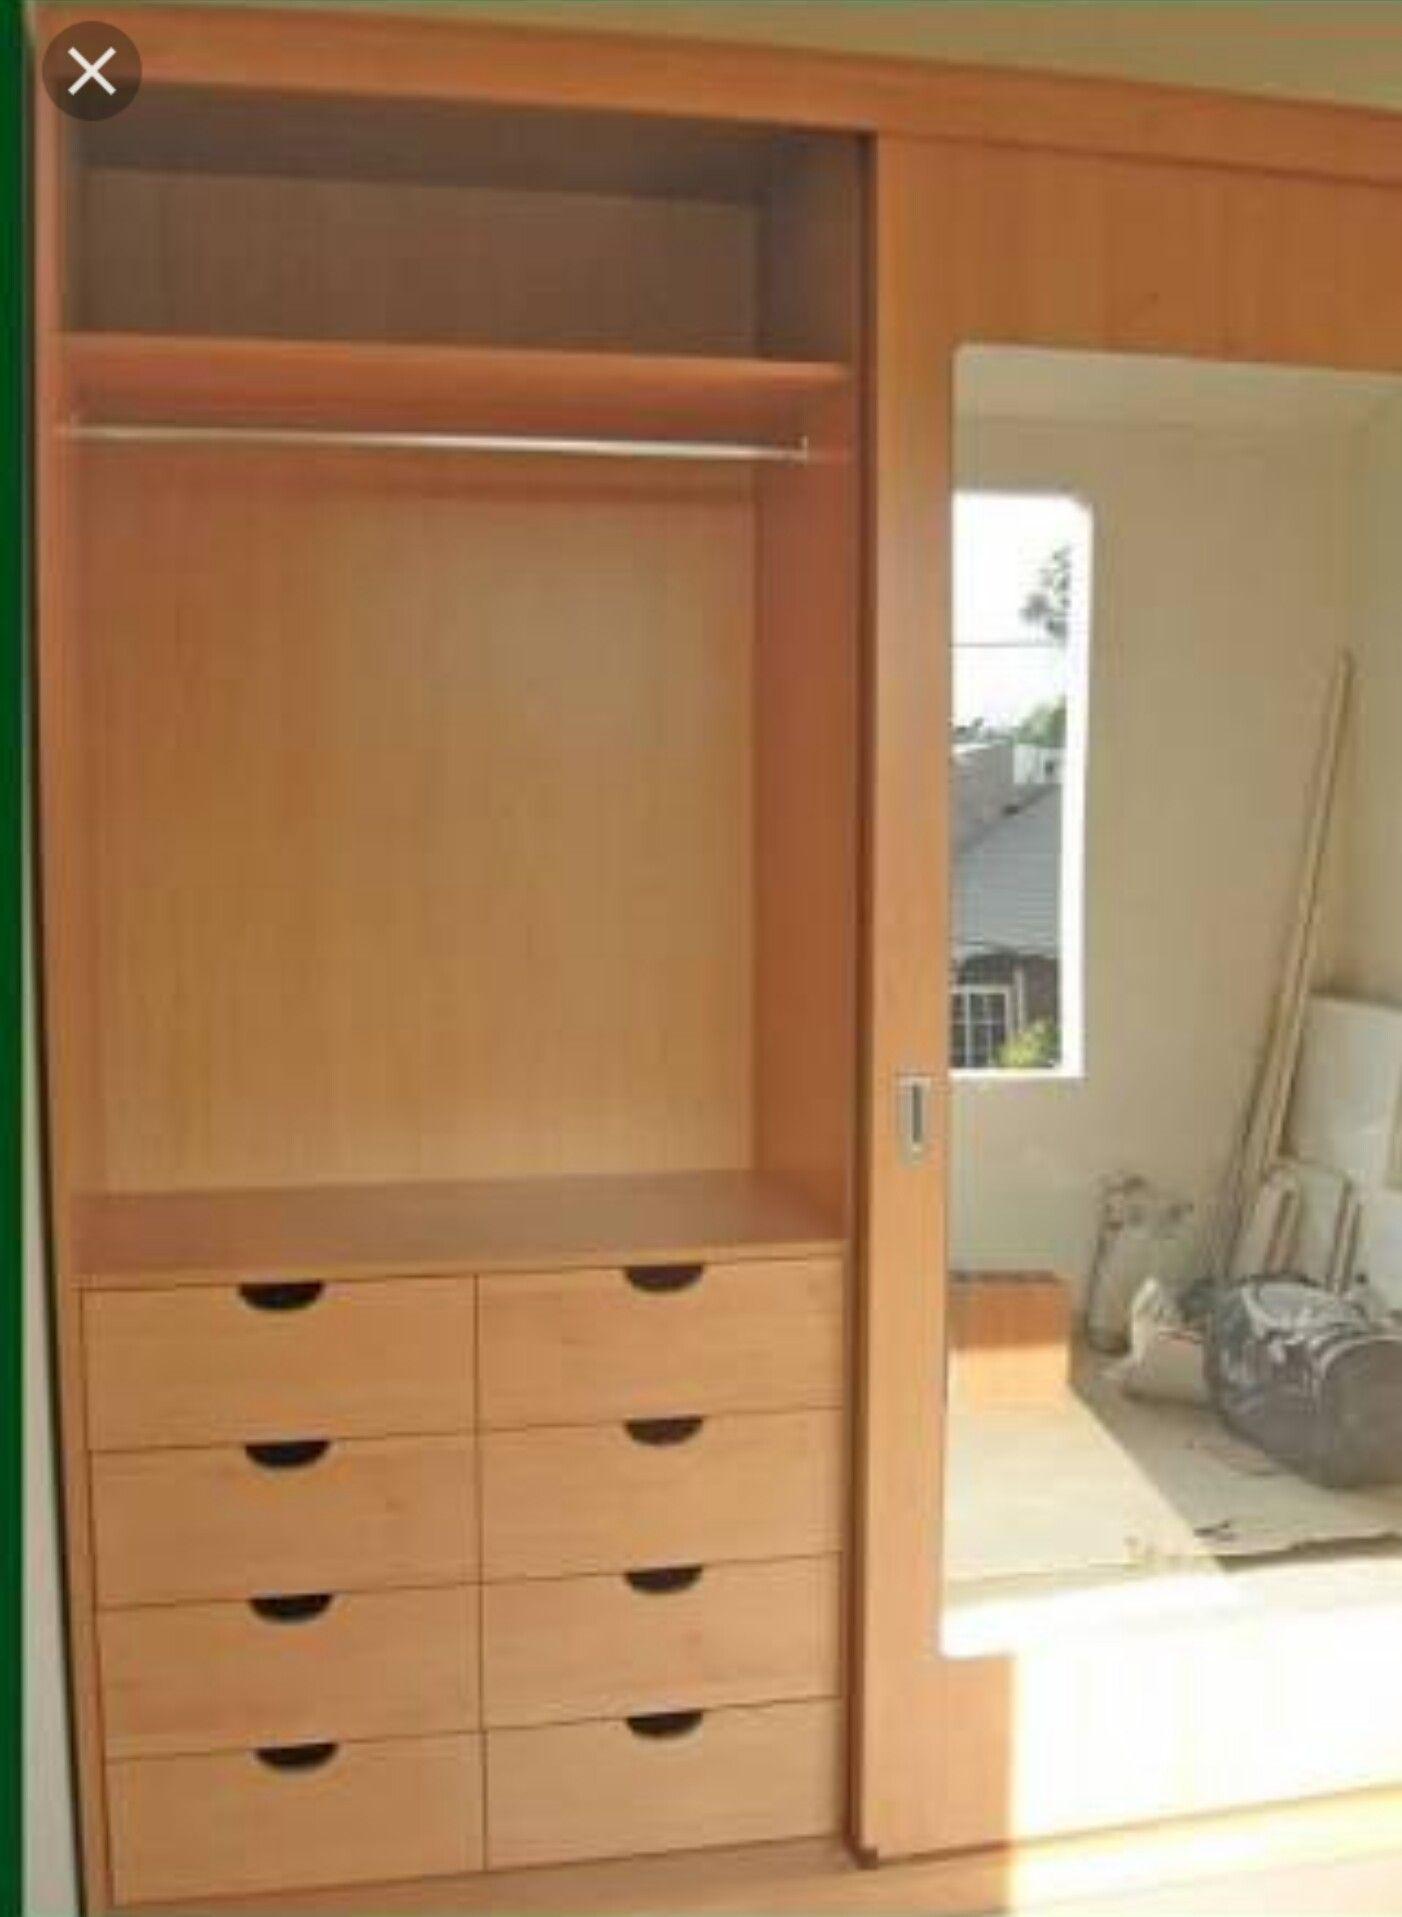 closet sport acular all organization star hgtv rack solutions design kid kids wardrobe rooms storage